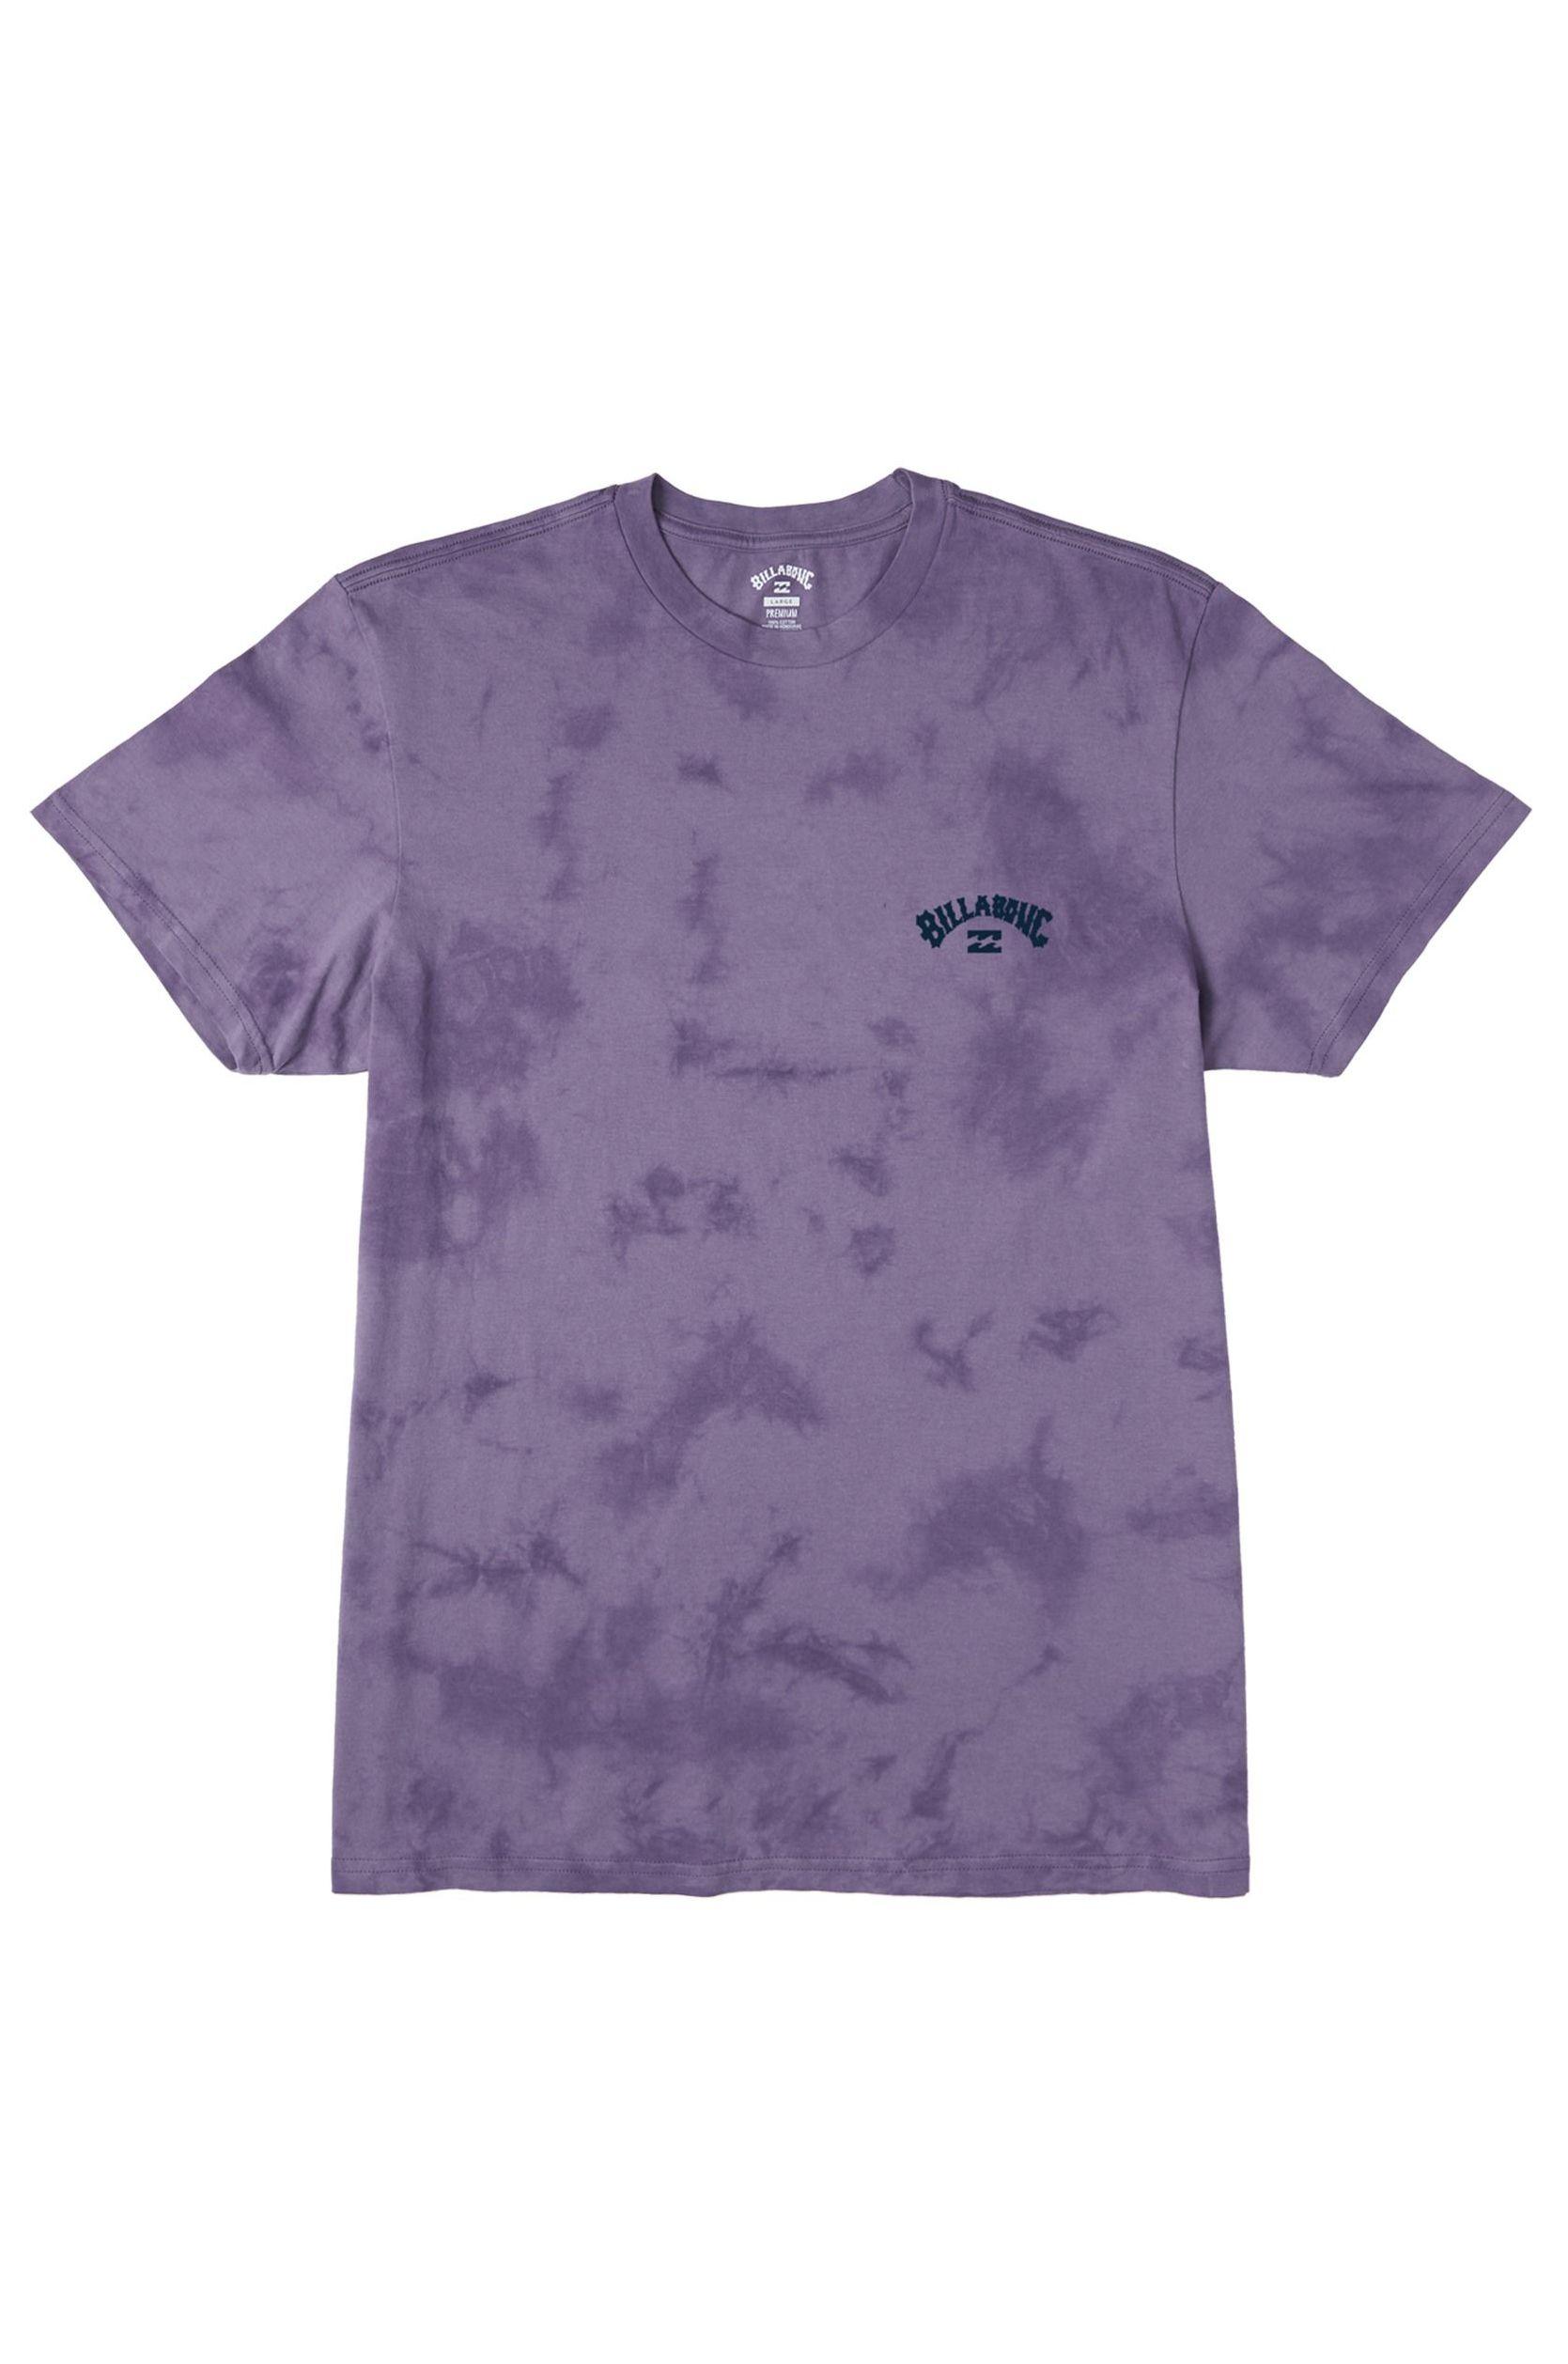 Billabong T-Shirt ARCH WAVE TIE DYE Purple Haze